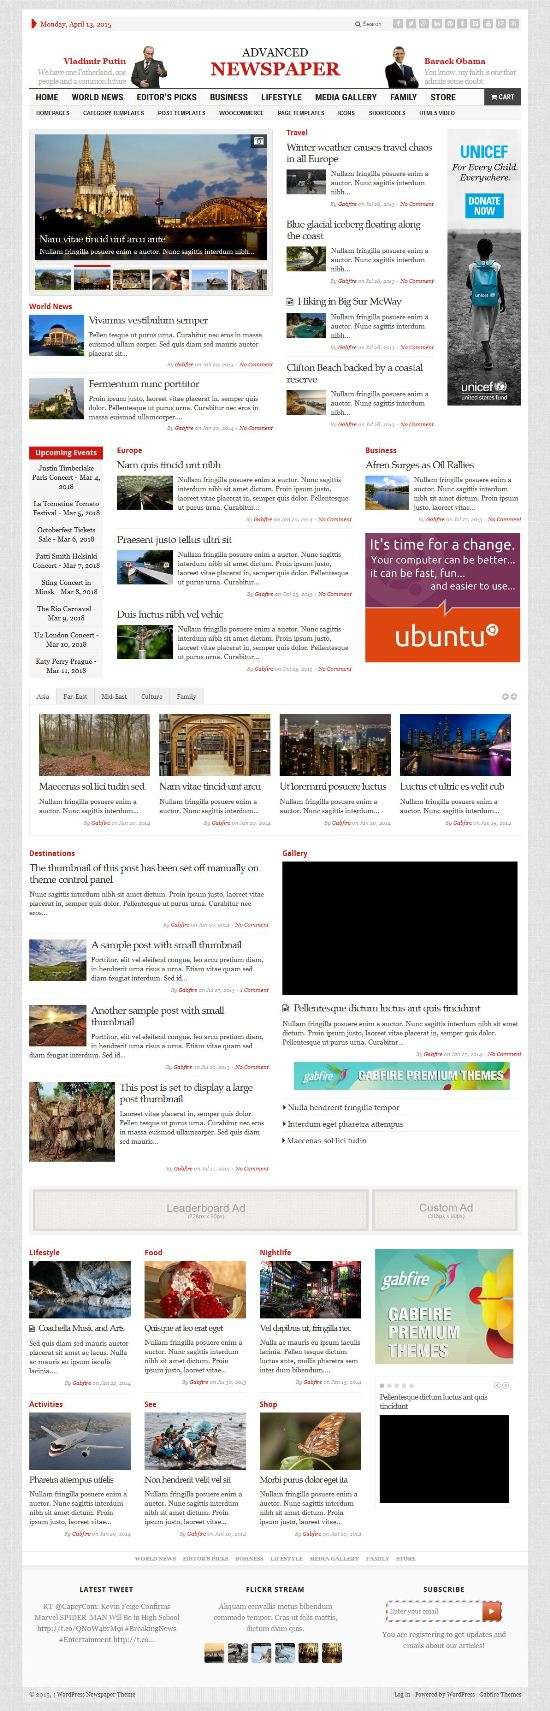 advanced newspaper gabfirethemes wordpress 01 - advanced-newspaper-gabfirethemes-wordpress-01